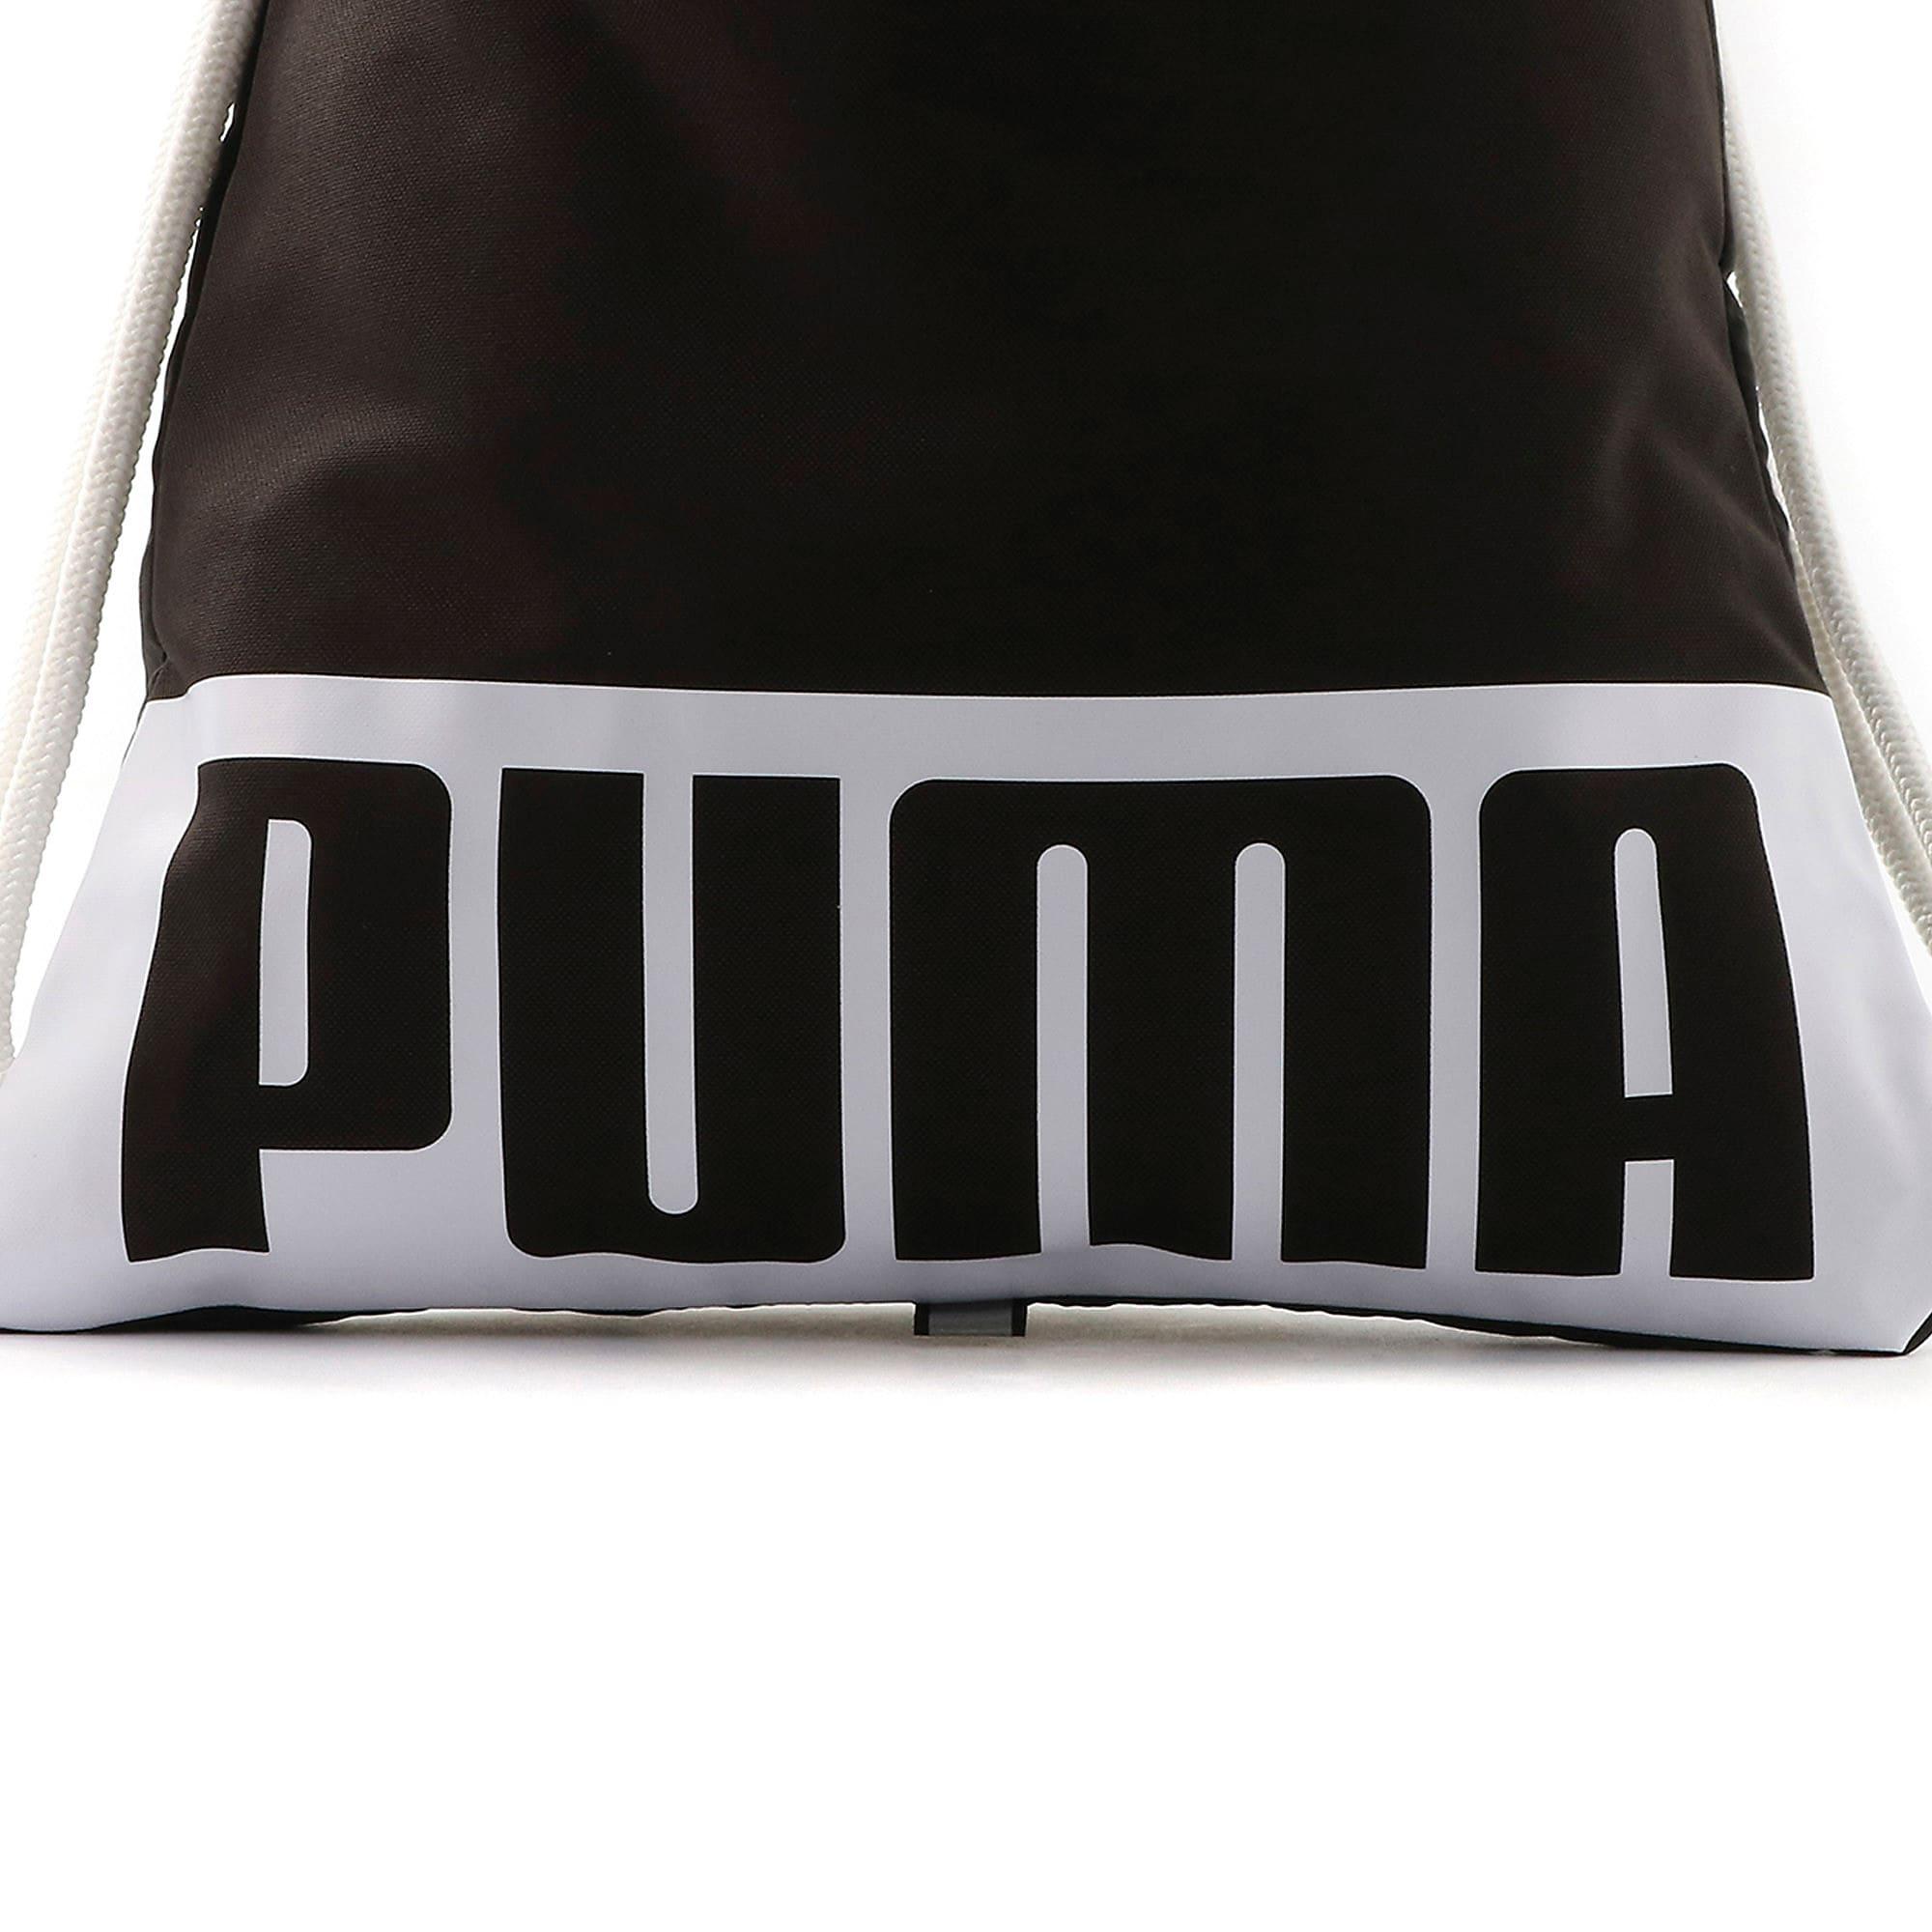 Thumbnail 4 of プーマ デッキ ジムサック 14.5L, Puma Black, medium-JPN